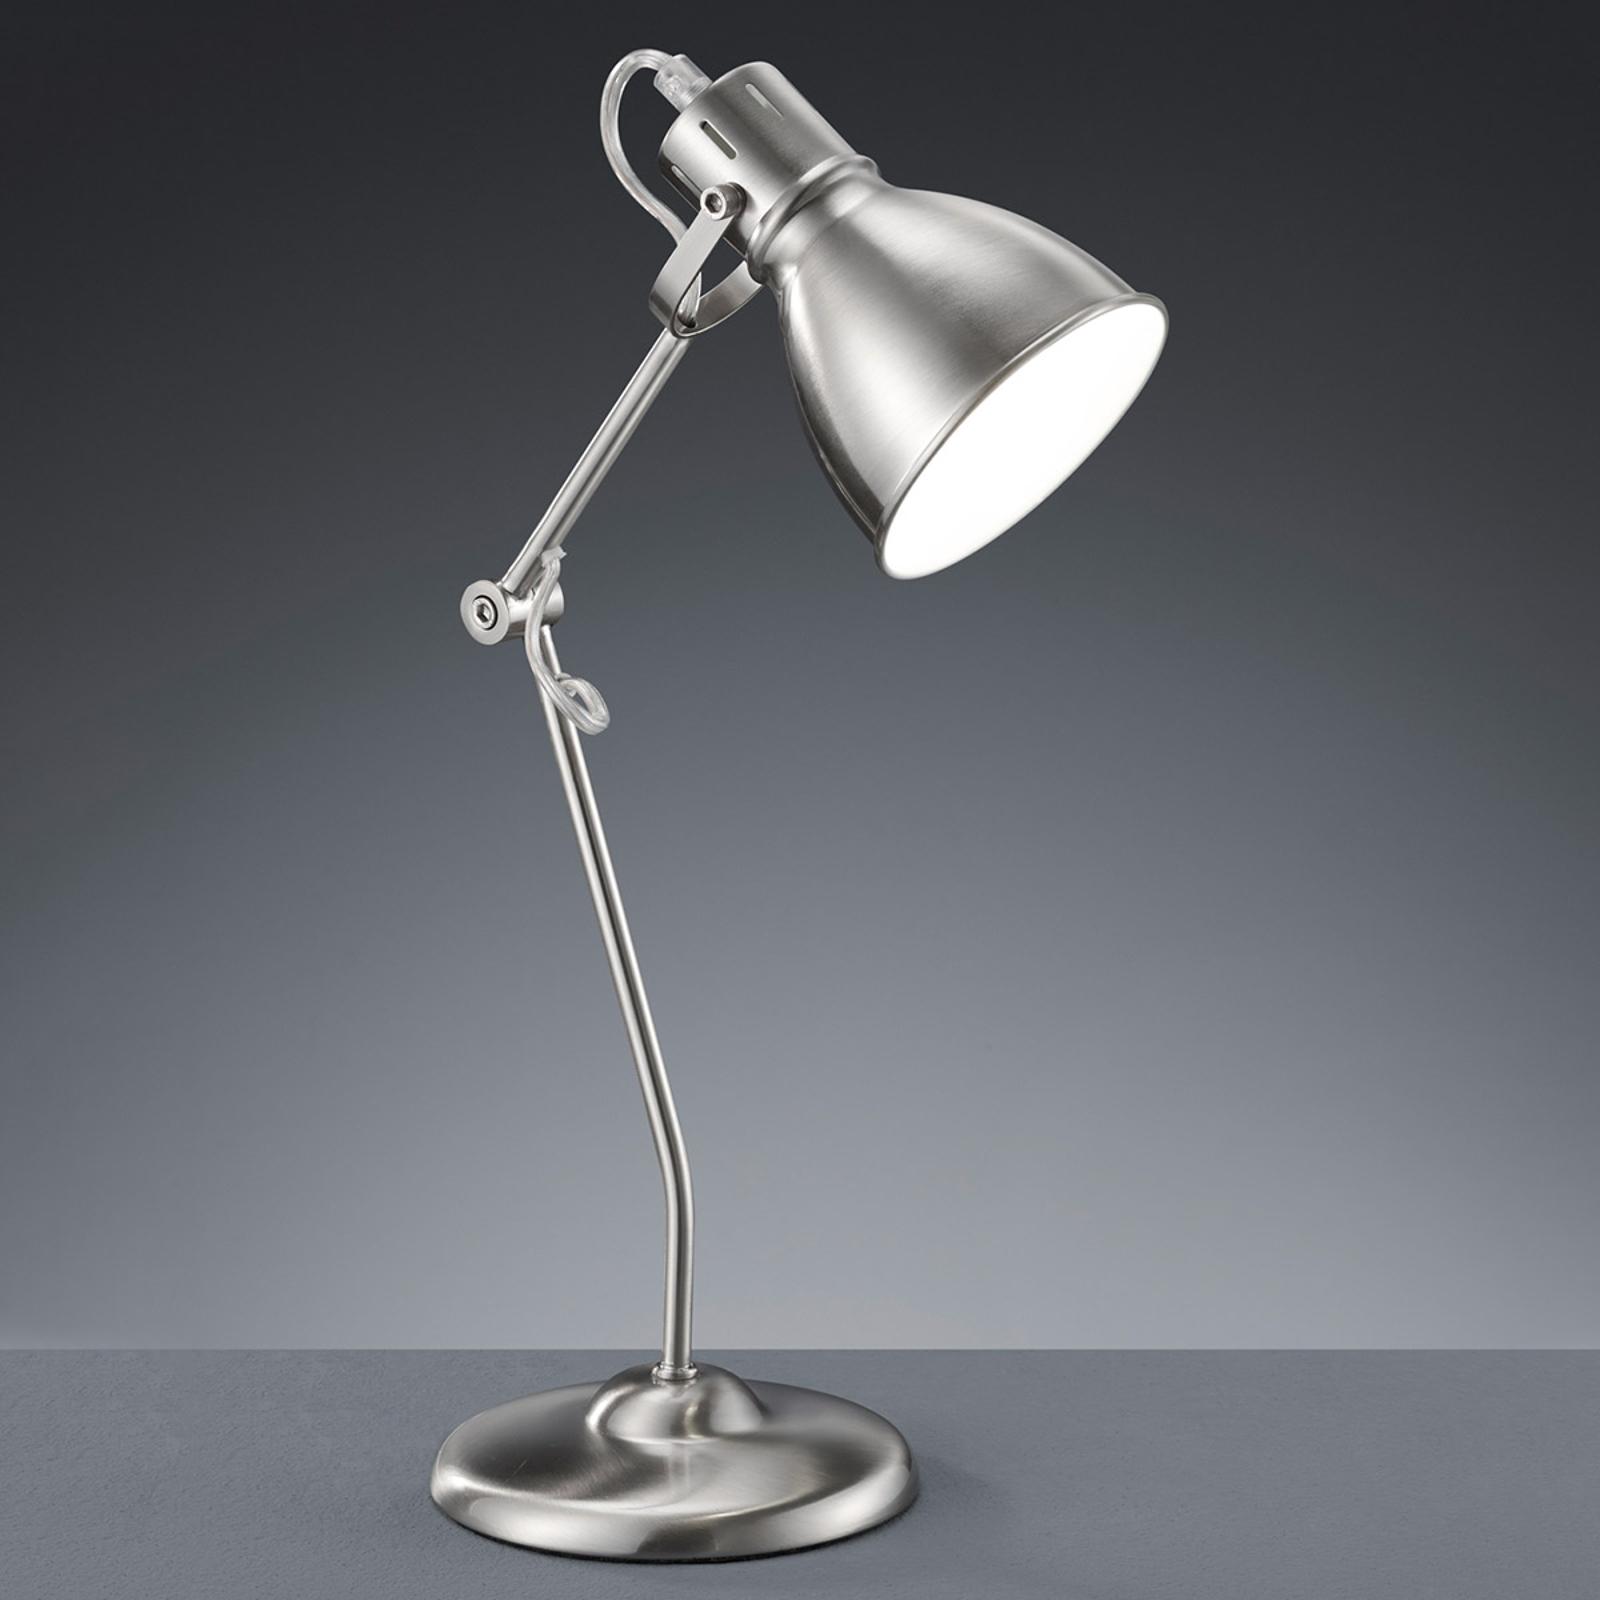 Lampe à poser Keali nickel mat, hauteur ajustable